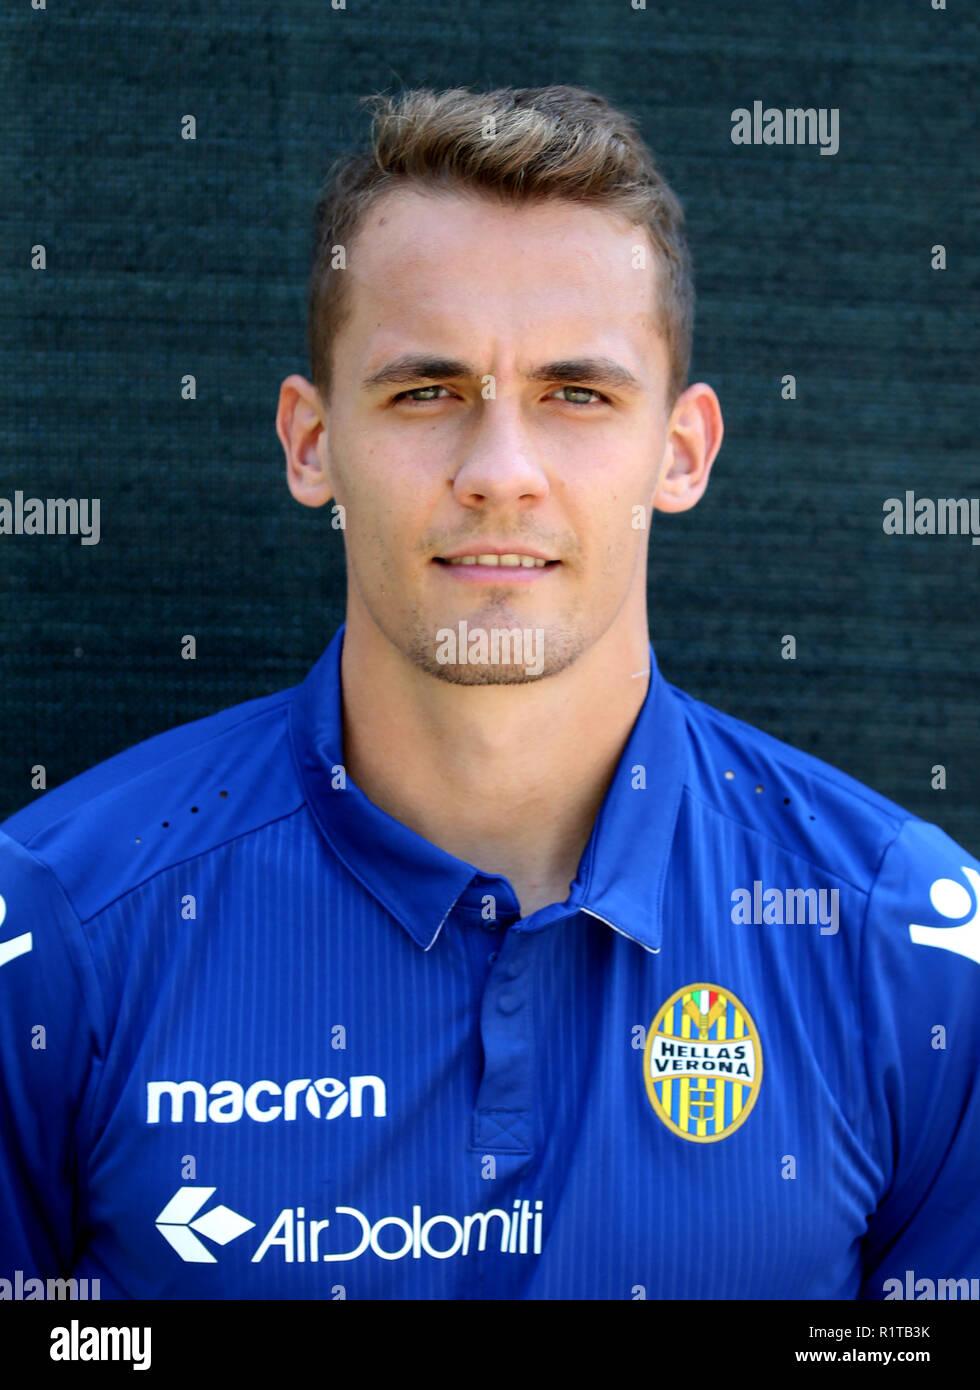 Italy - Serie B BKT 2018-2019 /  ( Hellas Verona F.C. ) -  Jure Balkovec - Stock Image